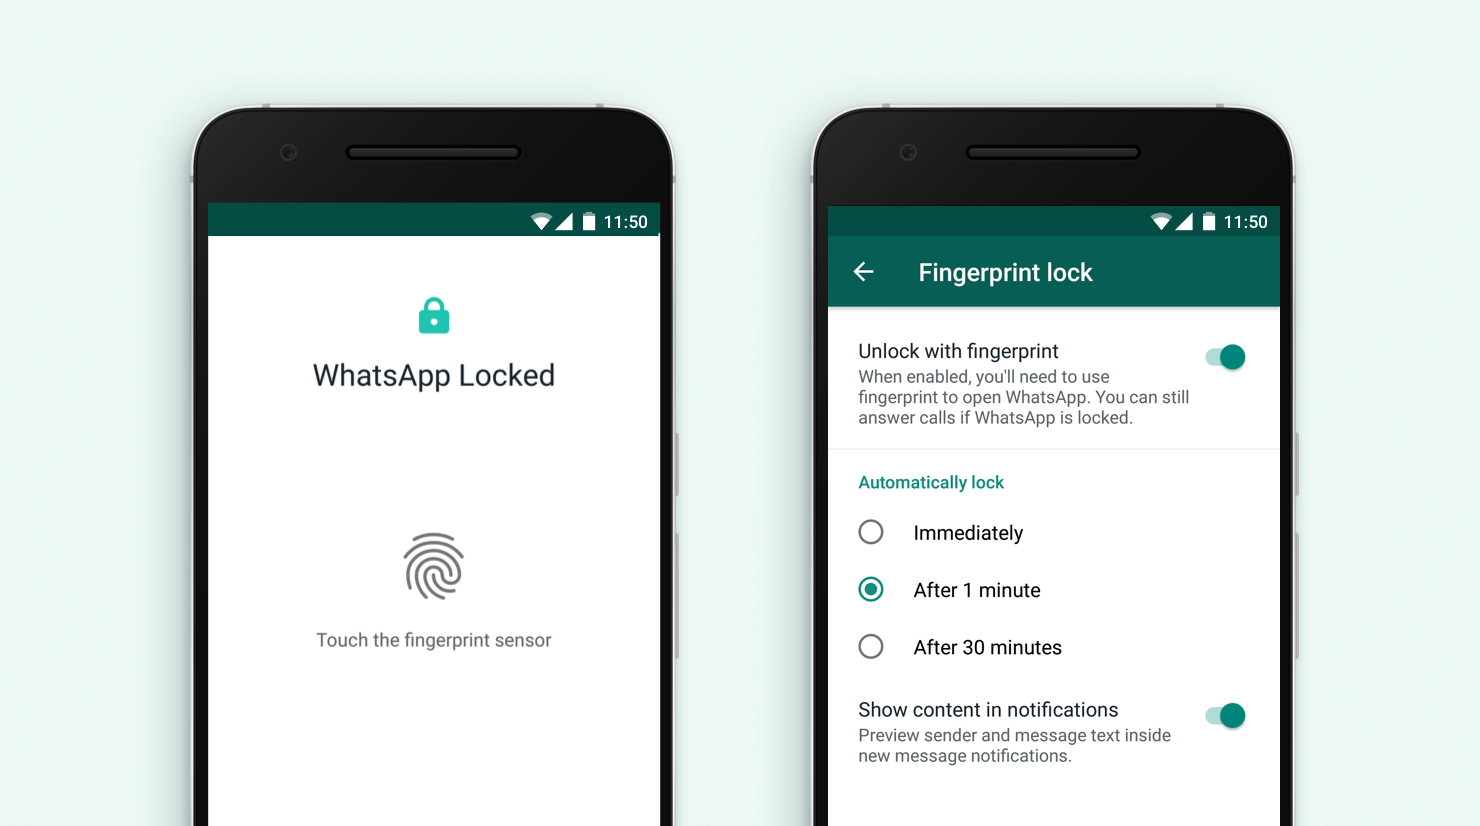 WhatsApp Fingerprint Android